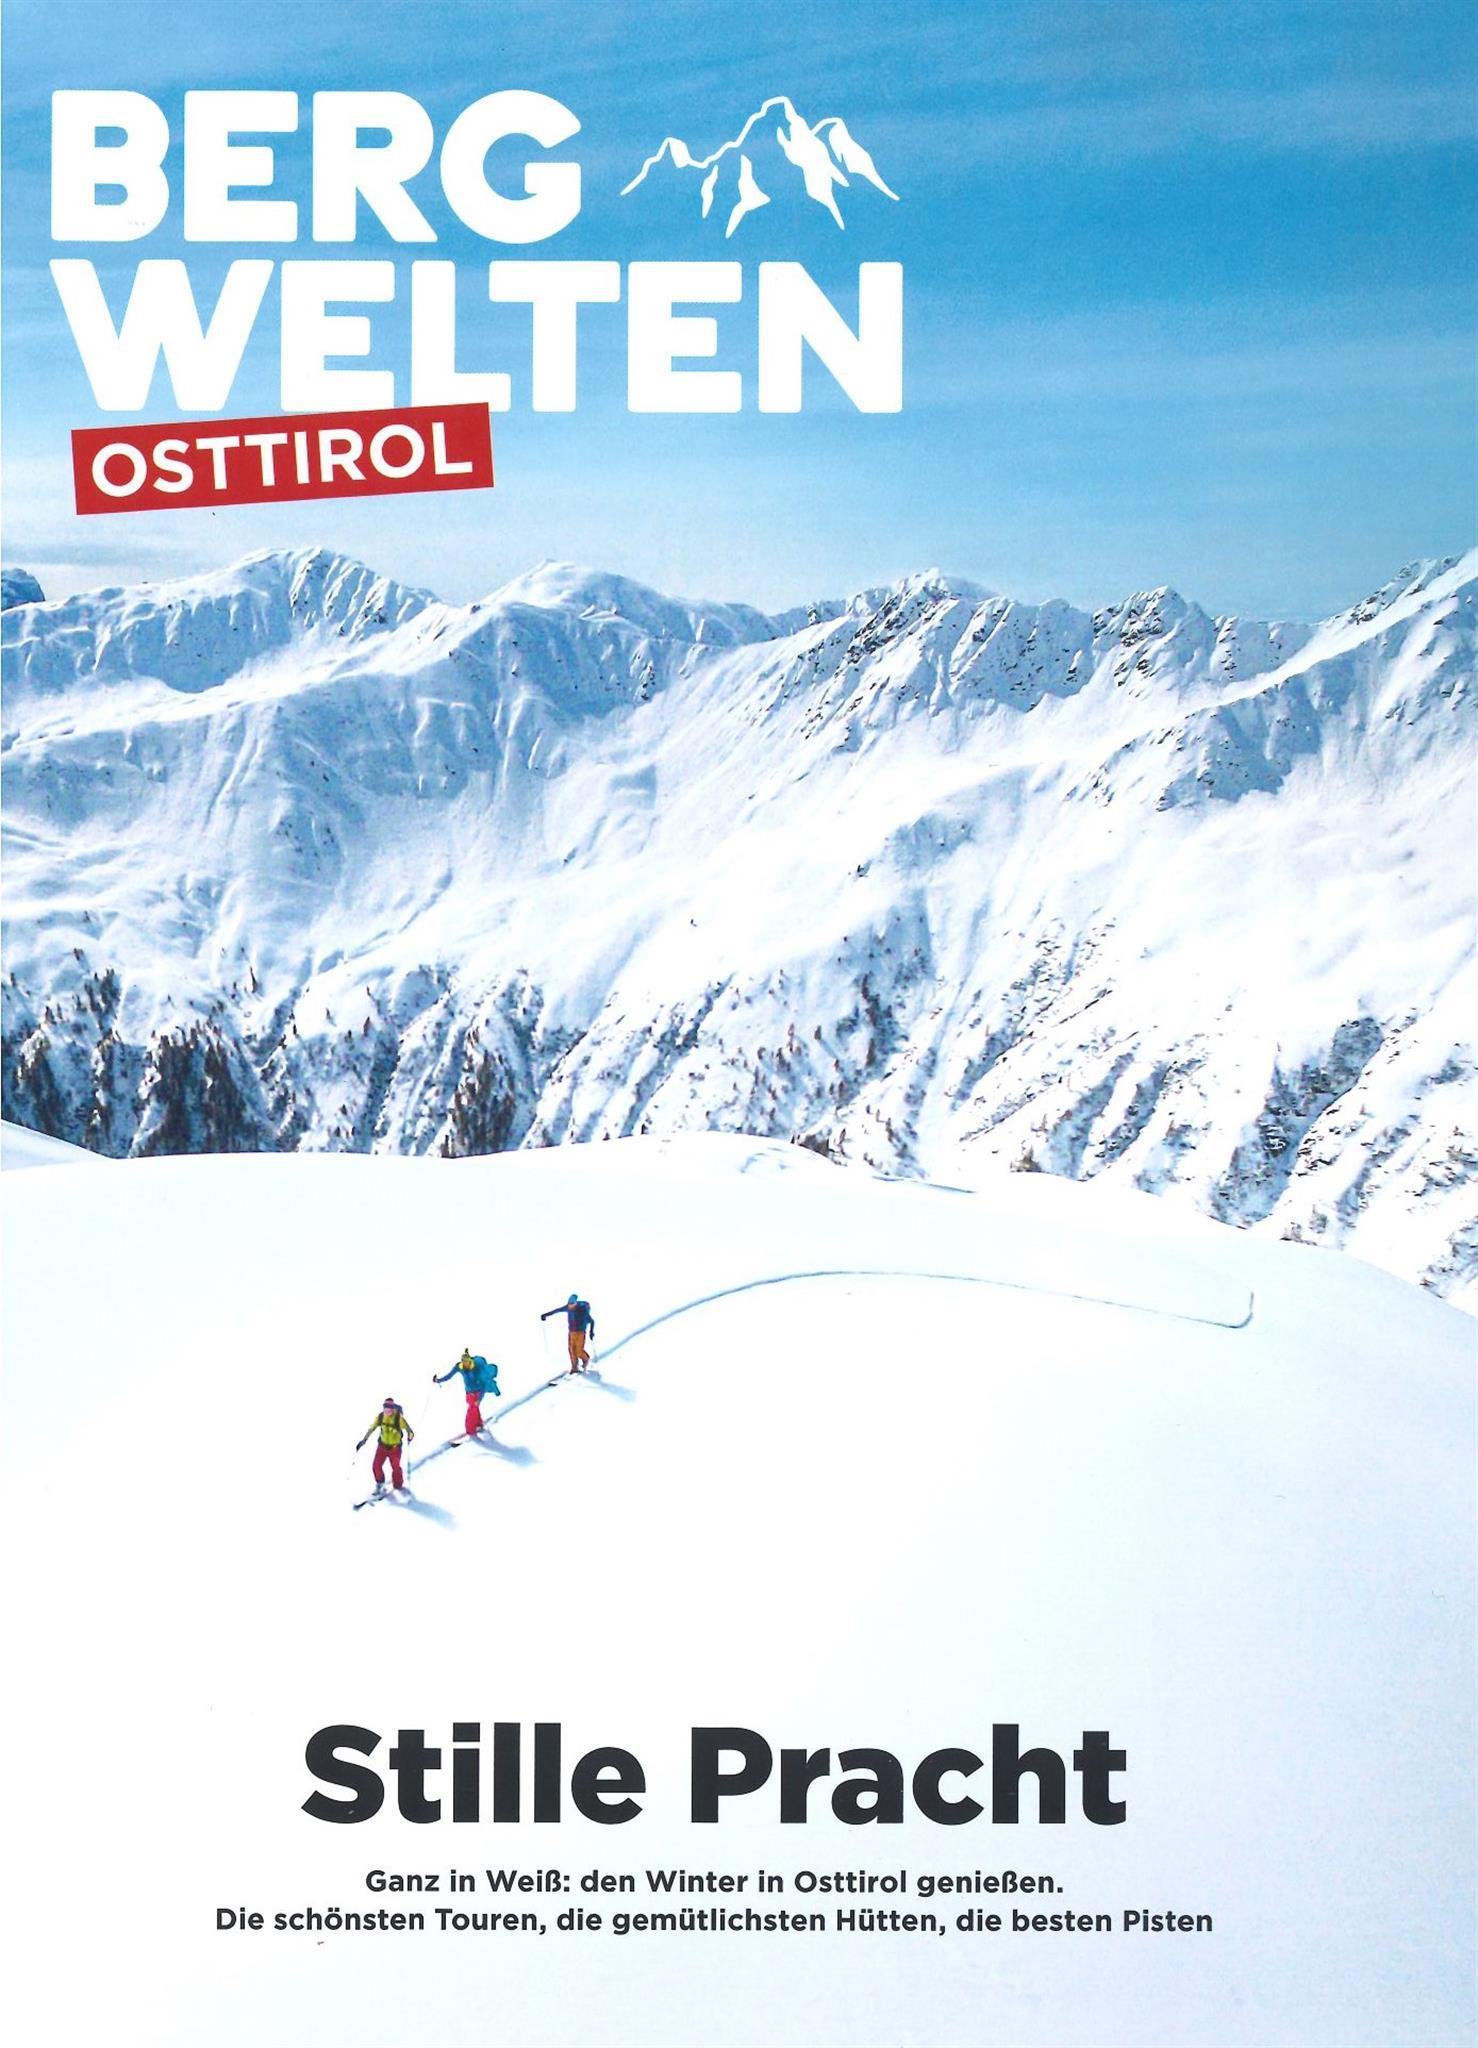 Bergwelten-Osttirol.jpg